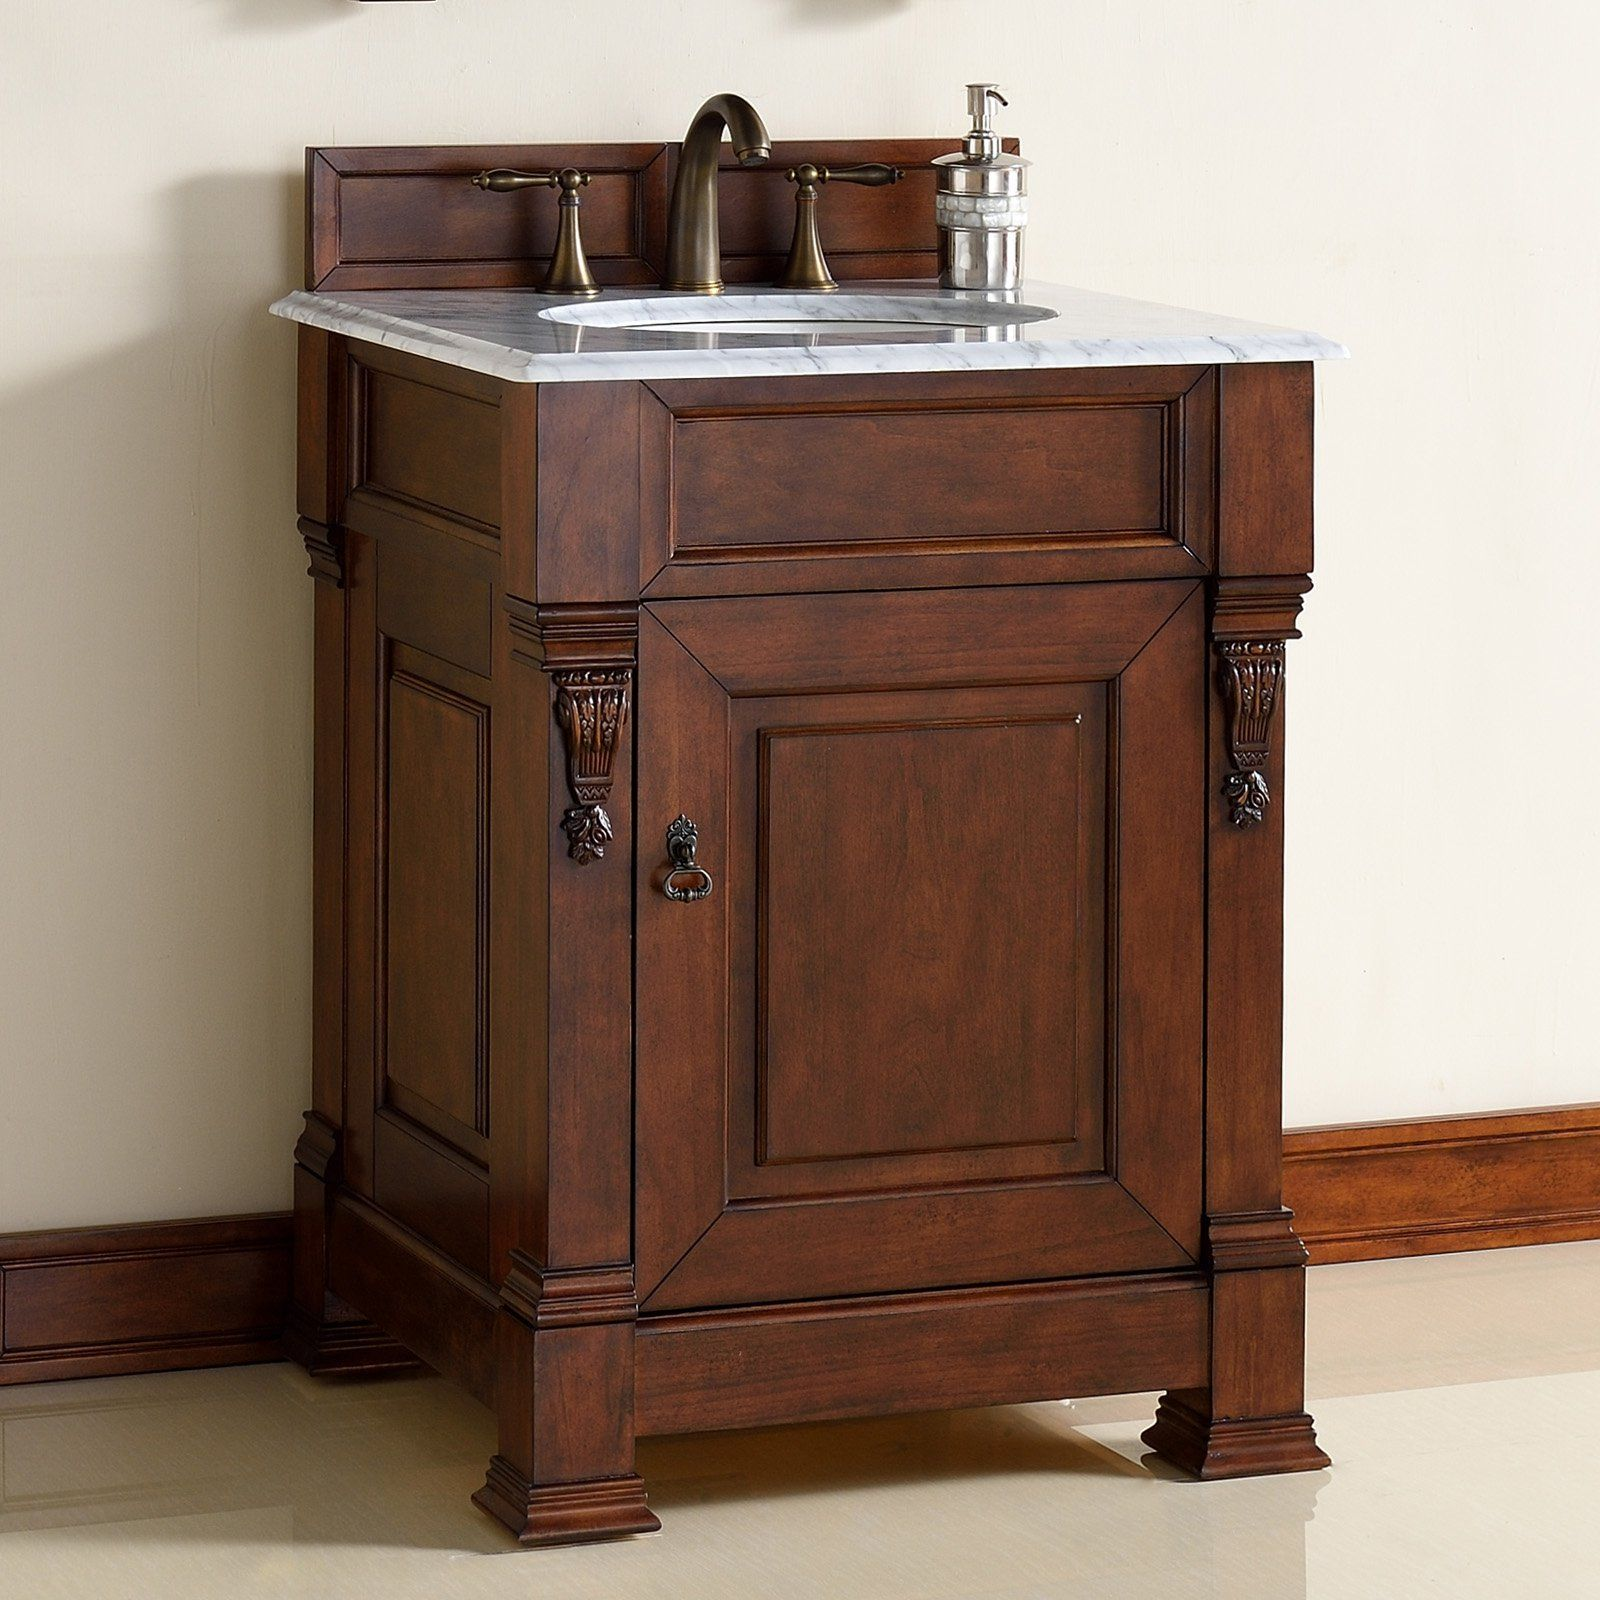 James Martin Brookfield In Single Bathroom Vanity From - 42 inch bathroom vanity top for bathroom decor ideas